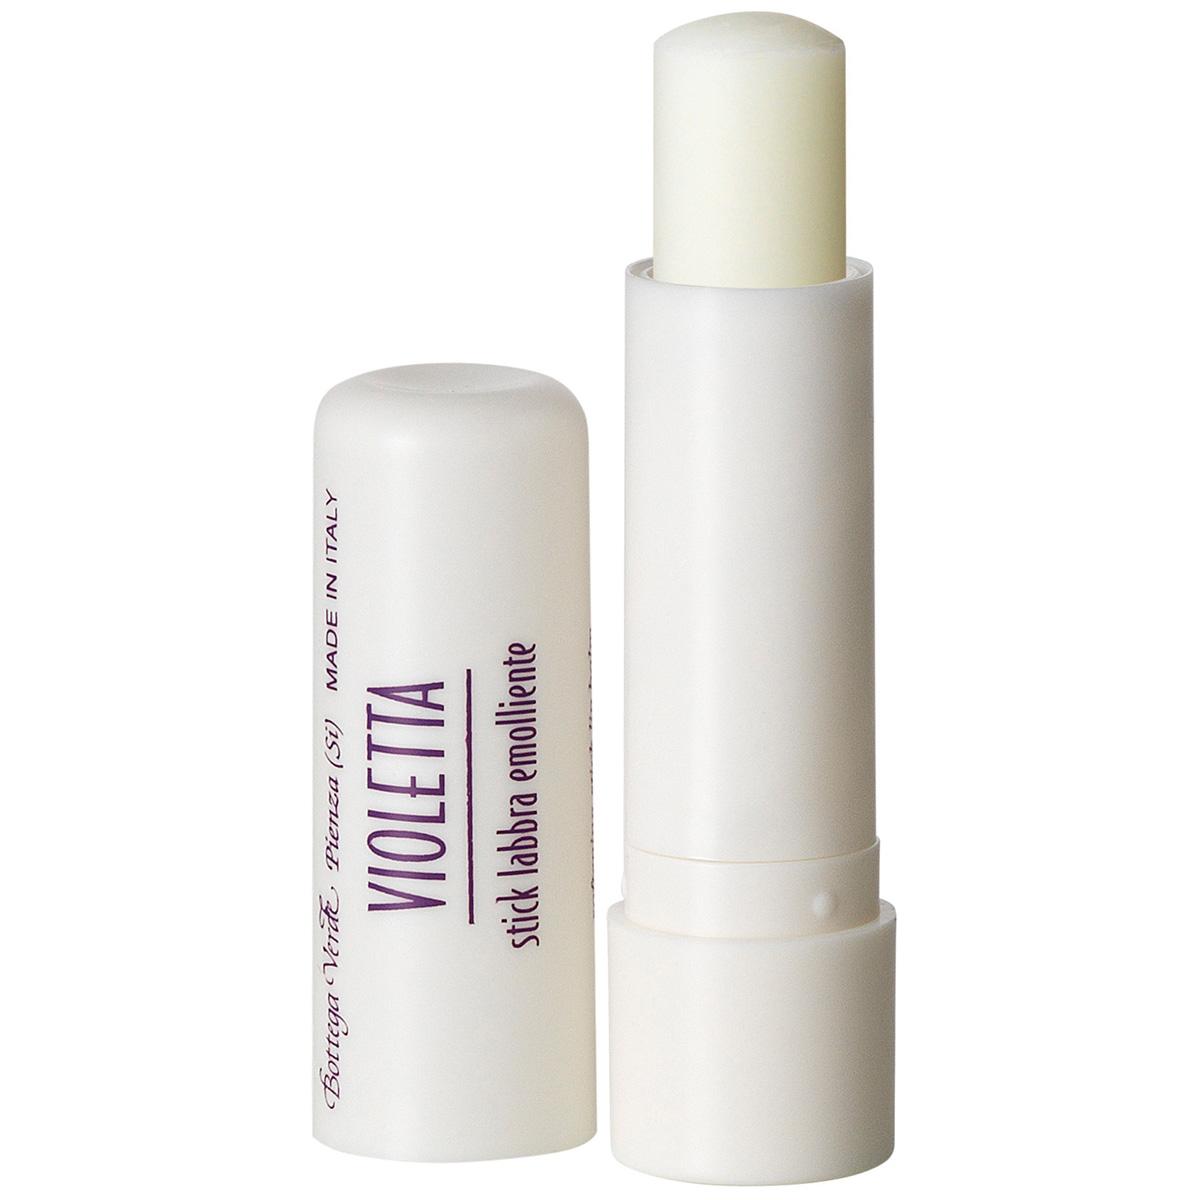 Balsam de buze emolient cu aroma de violete, incolor - Violetta, 5 ML